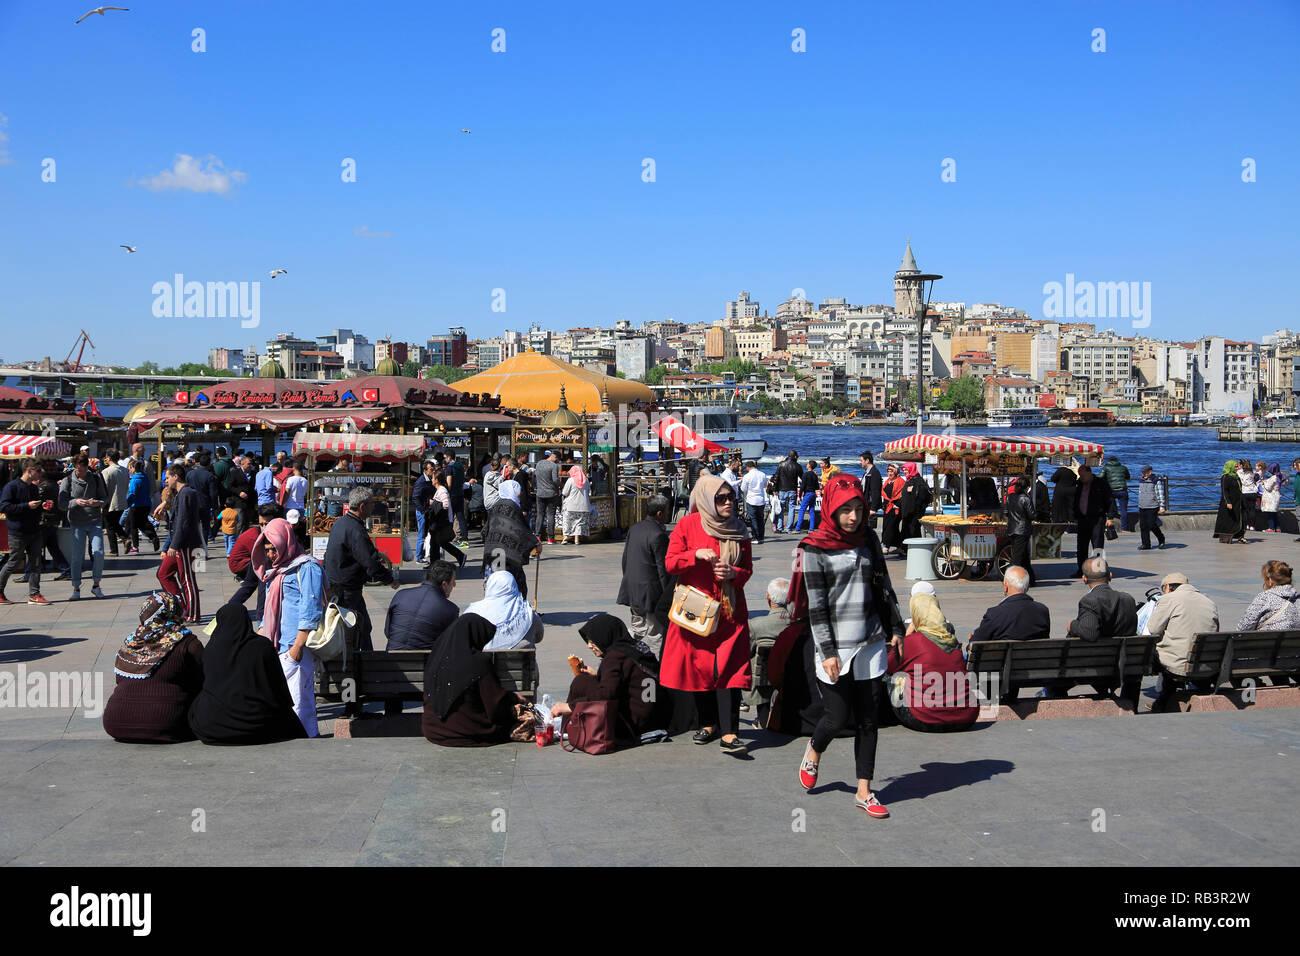 Eminonu, Old City, Golden Horn, Bosphorus, Istanbul, Turkey, Europe - Stock Image